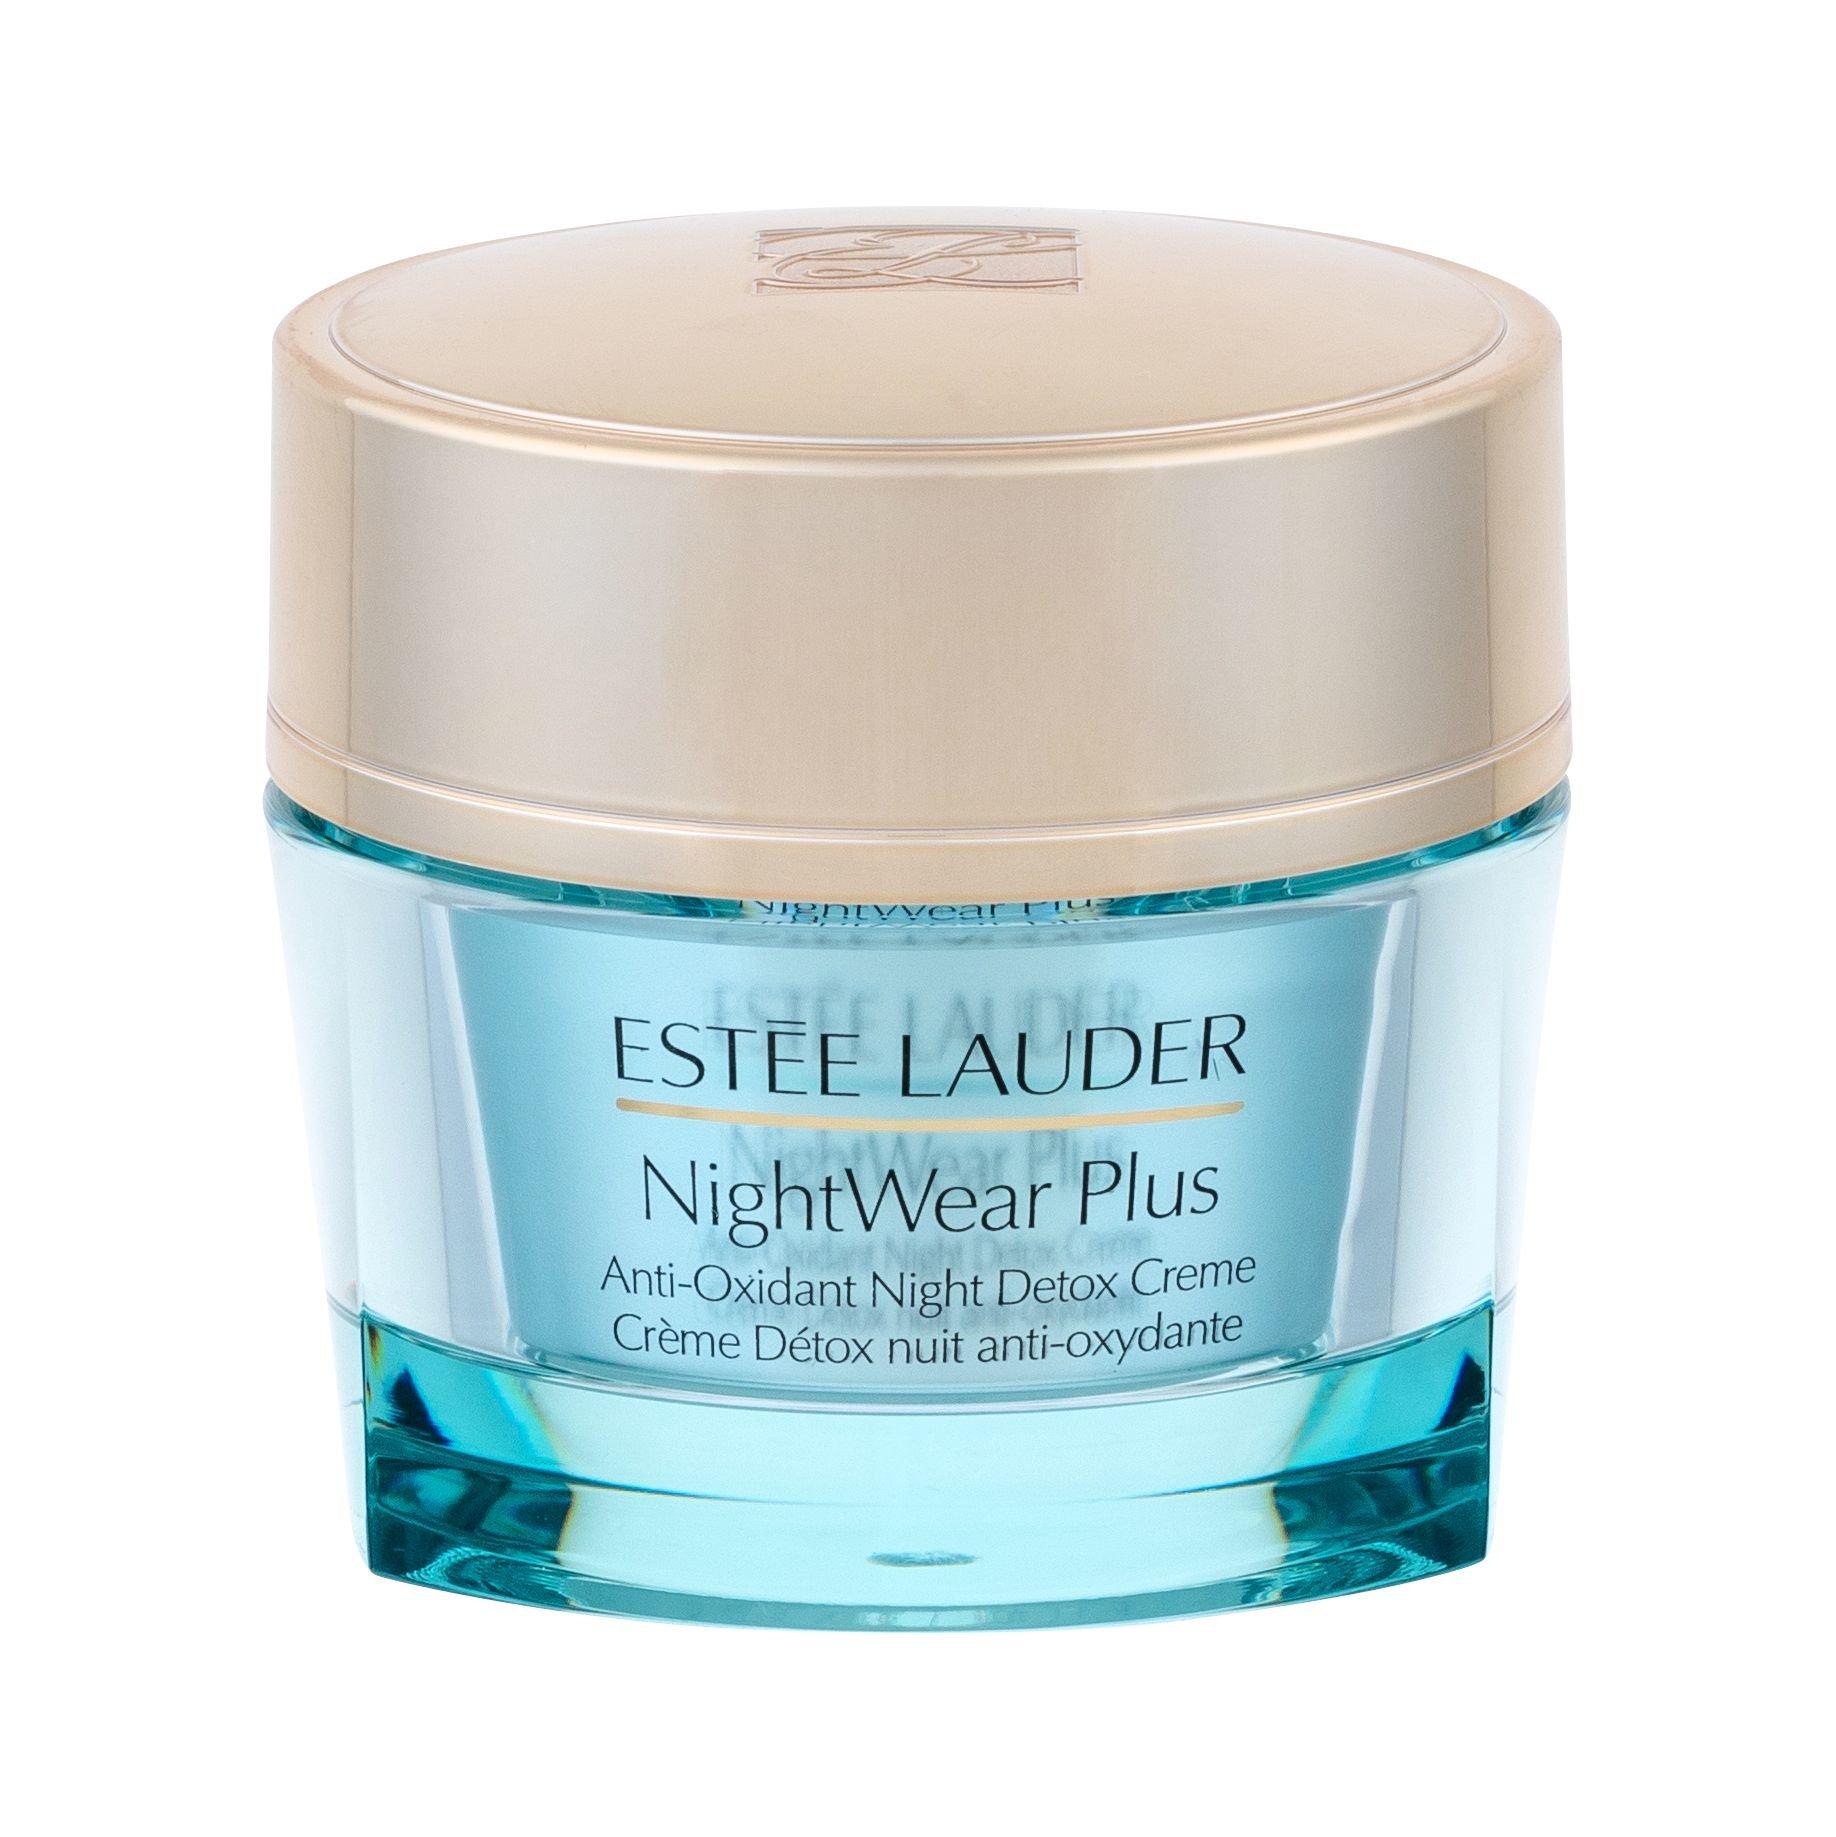 Estée Lauder NightWear Plus Night Skin Cream 50ml